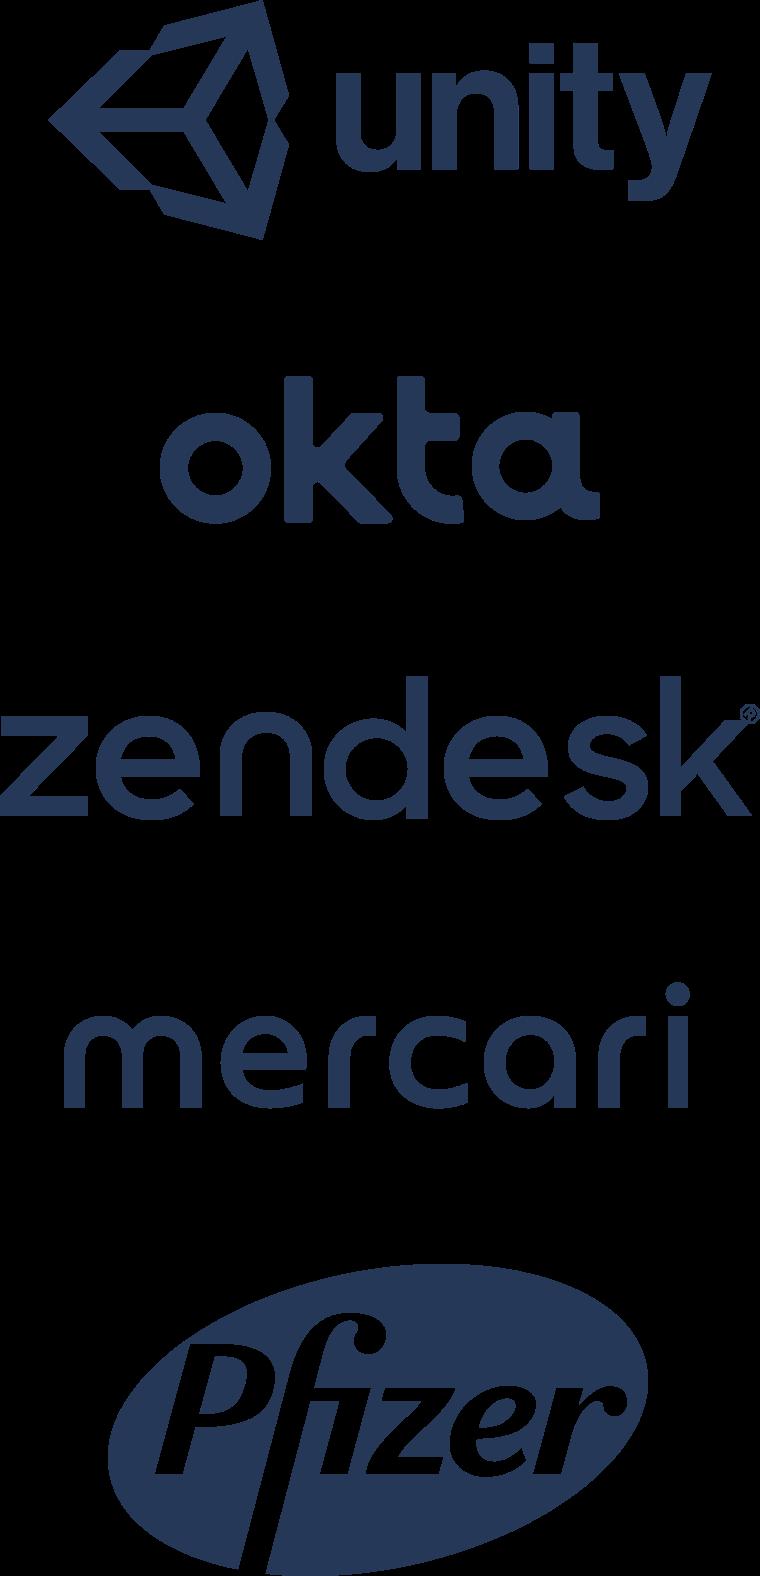 Unity, Okta, Zendesk, Mercari, Pfizer 로고